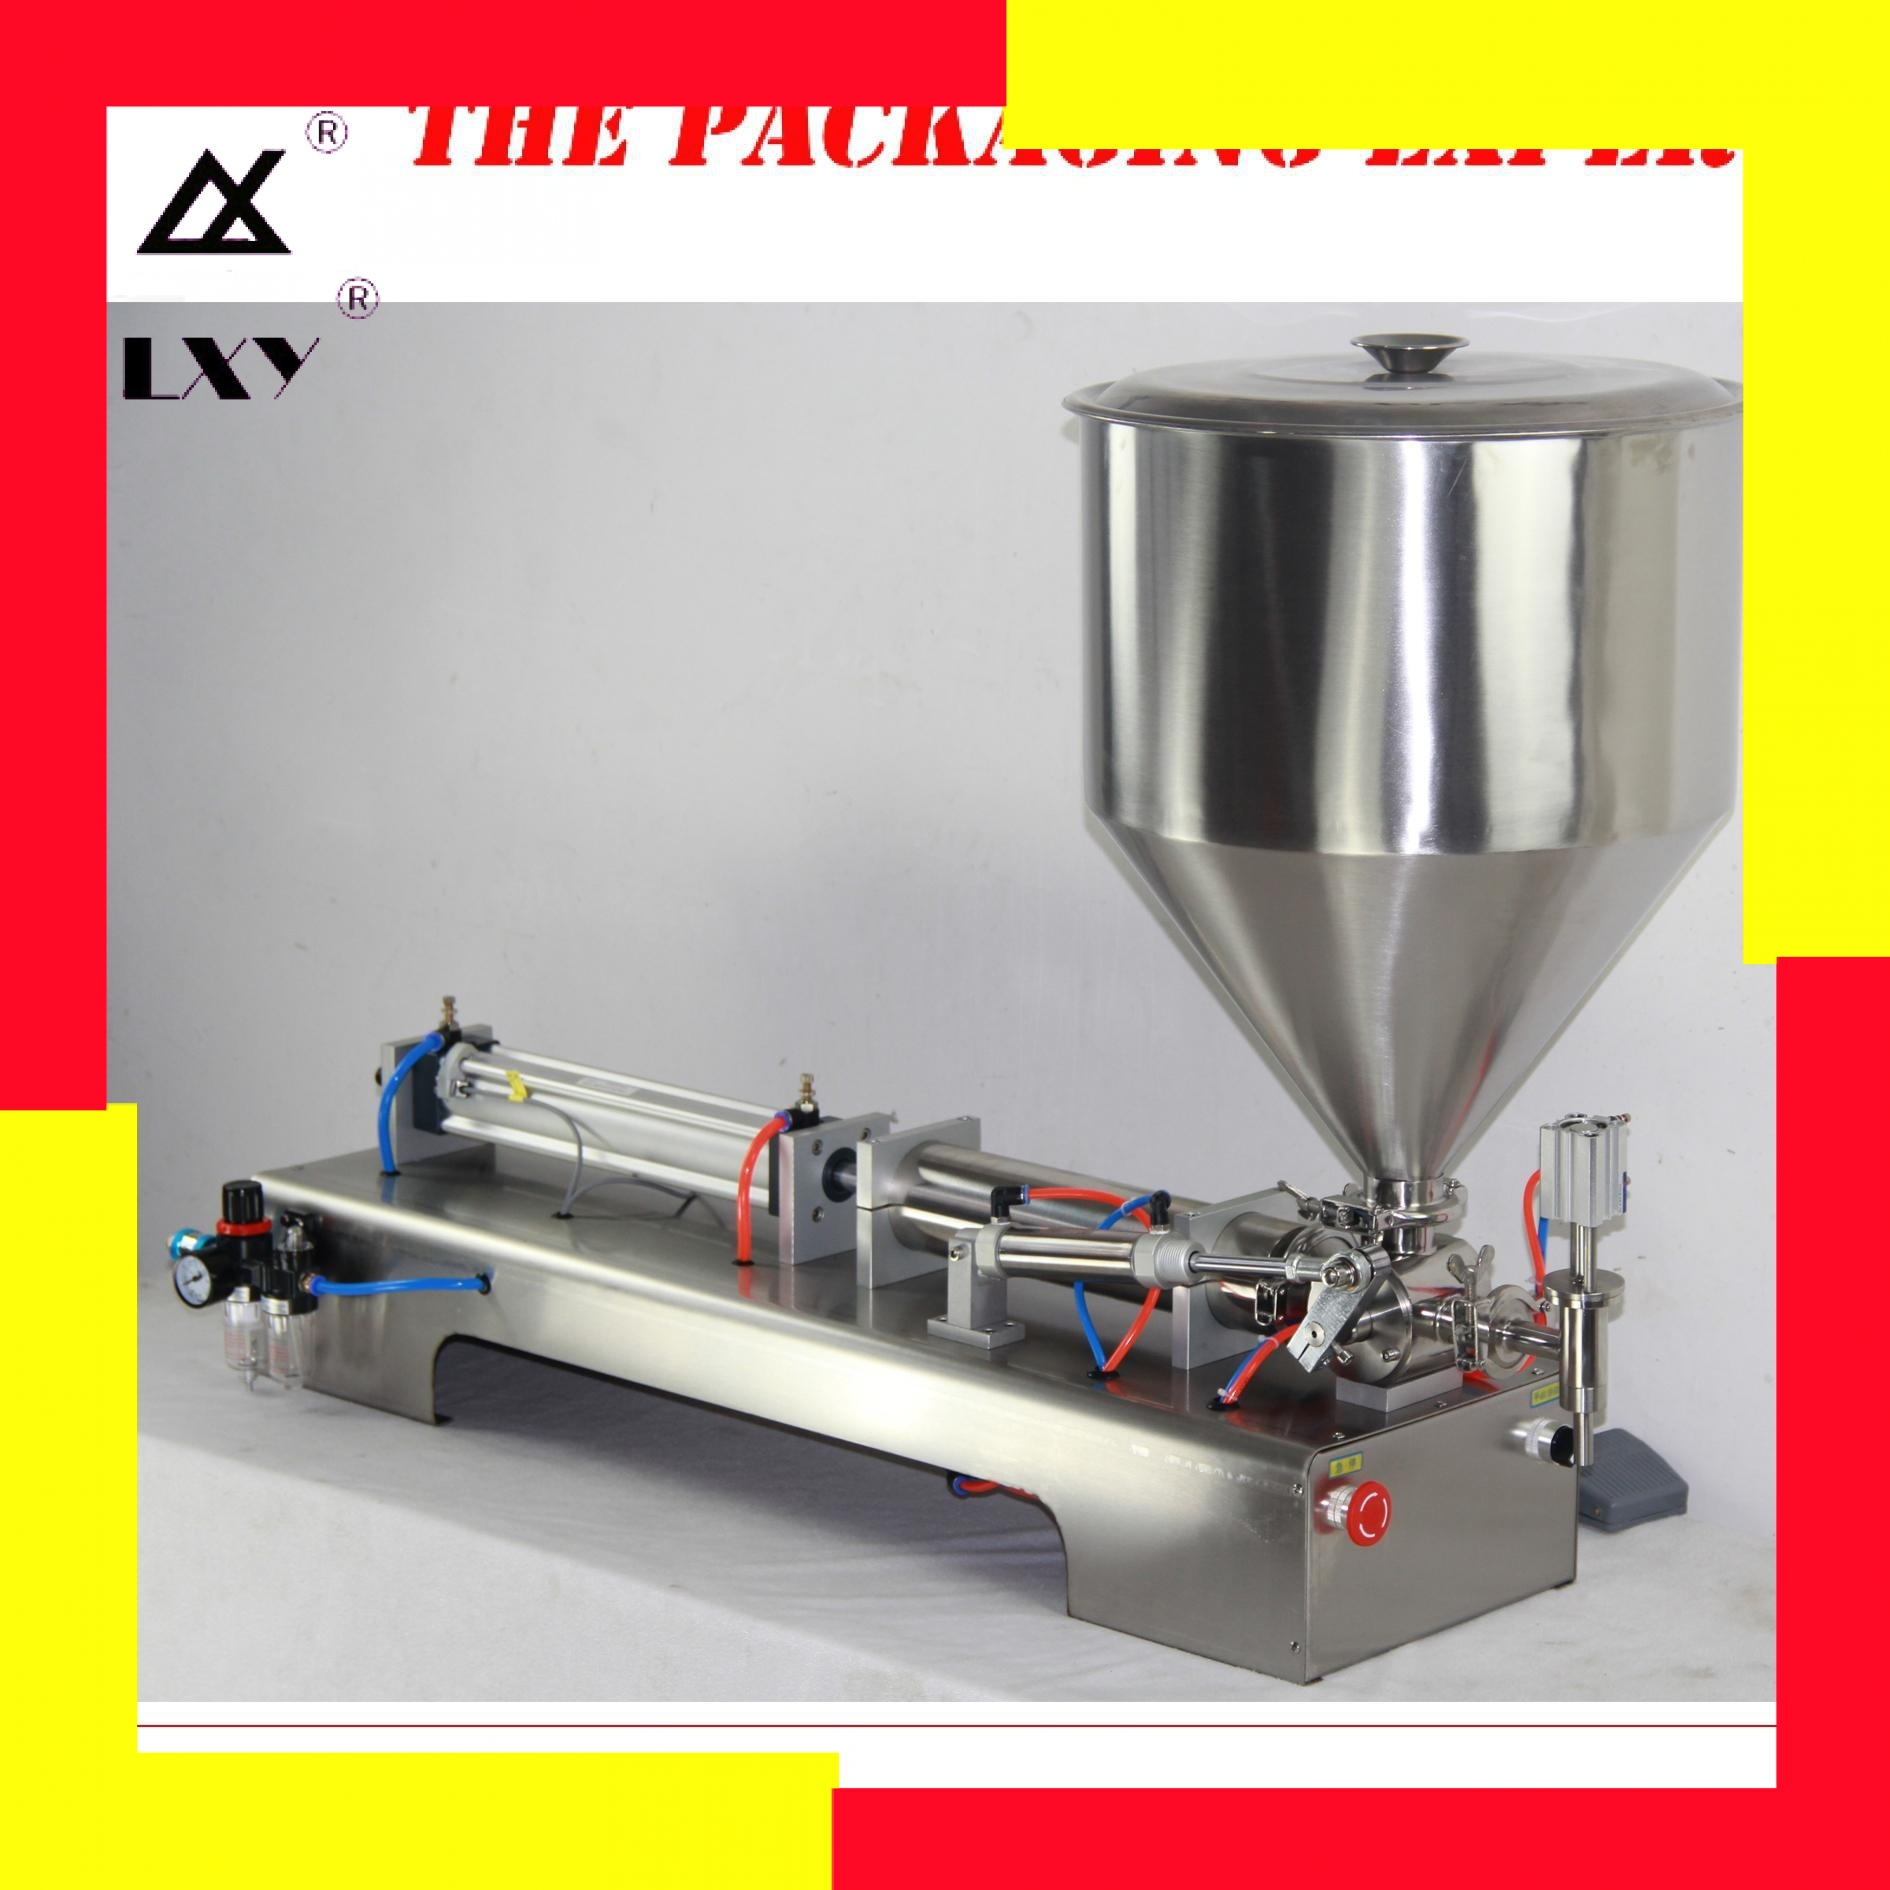 1-5000 Ml Pneumatic Piston Filling Of Liquid Paste Series  Wine Milk  Oil  Detergent Oghourt Honey Juice Sauce  Gel Filler Sauce